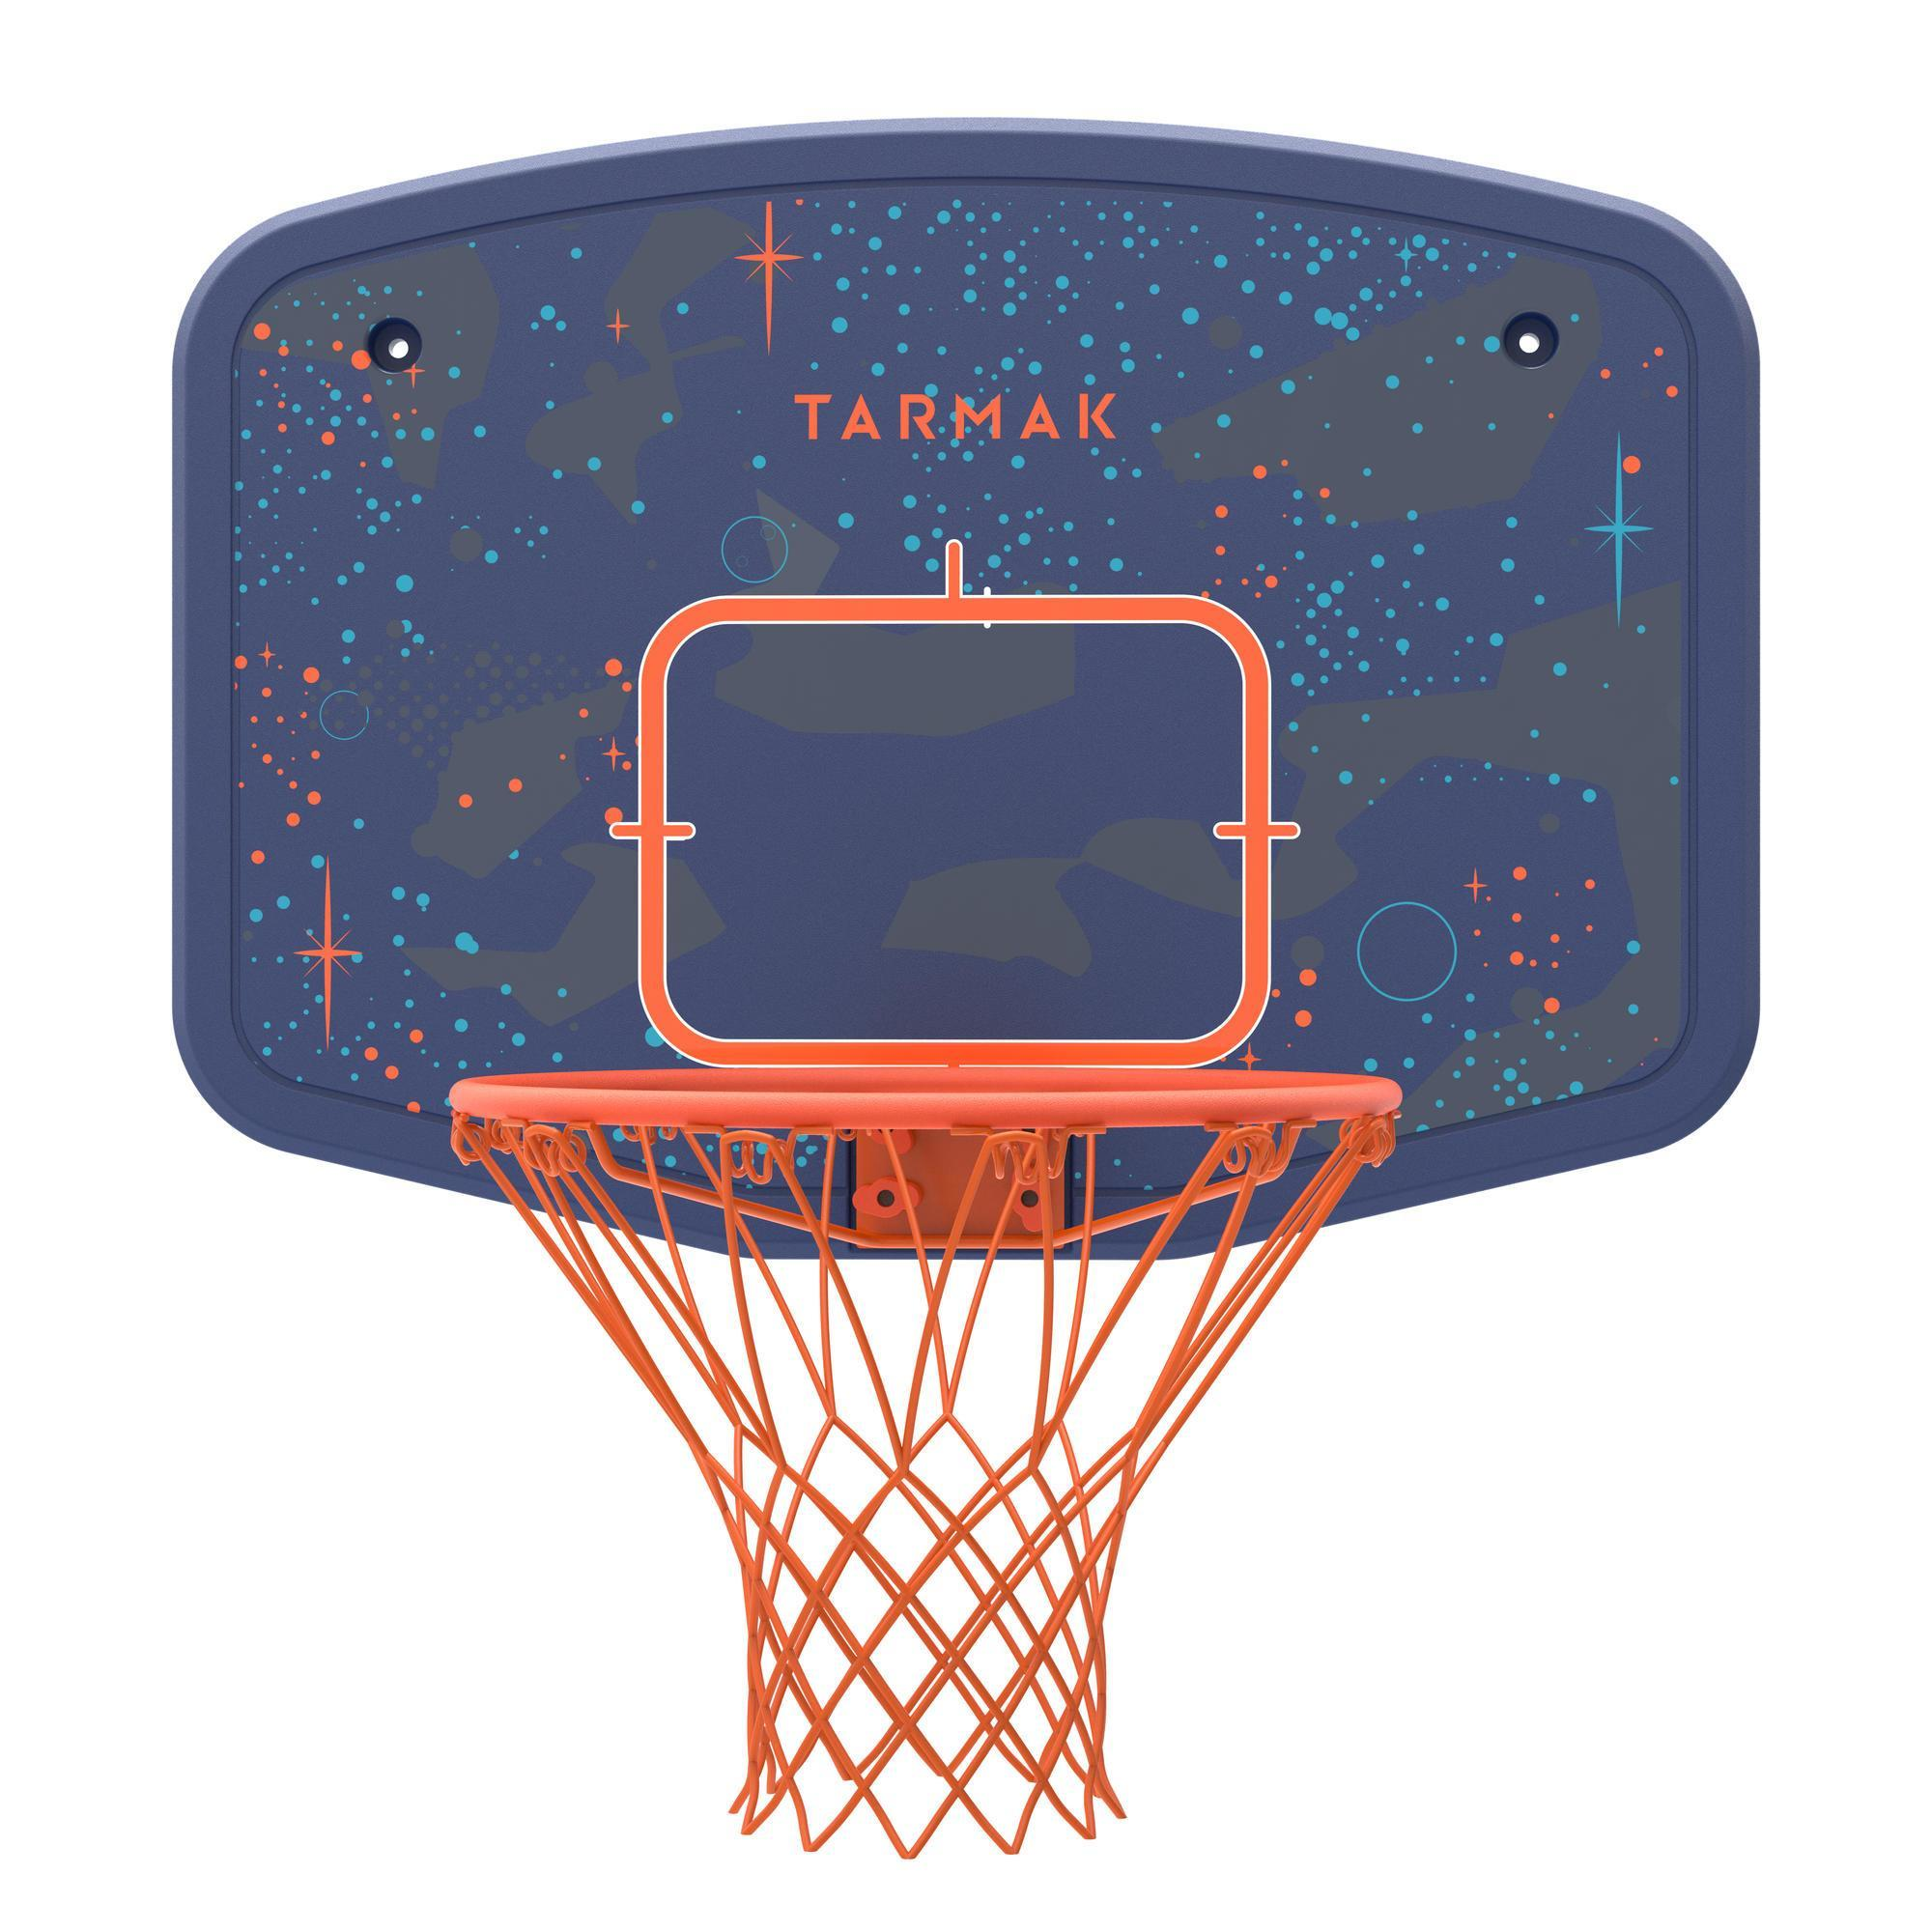 Tarmak Basketbalbord B200 Easy met muurbevestiging blauw. kinderen tot 10 jaar.